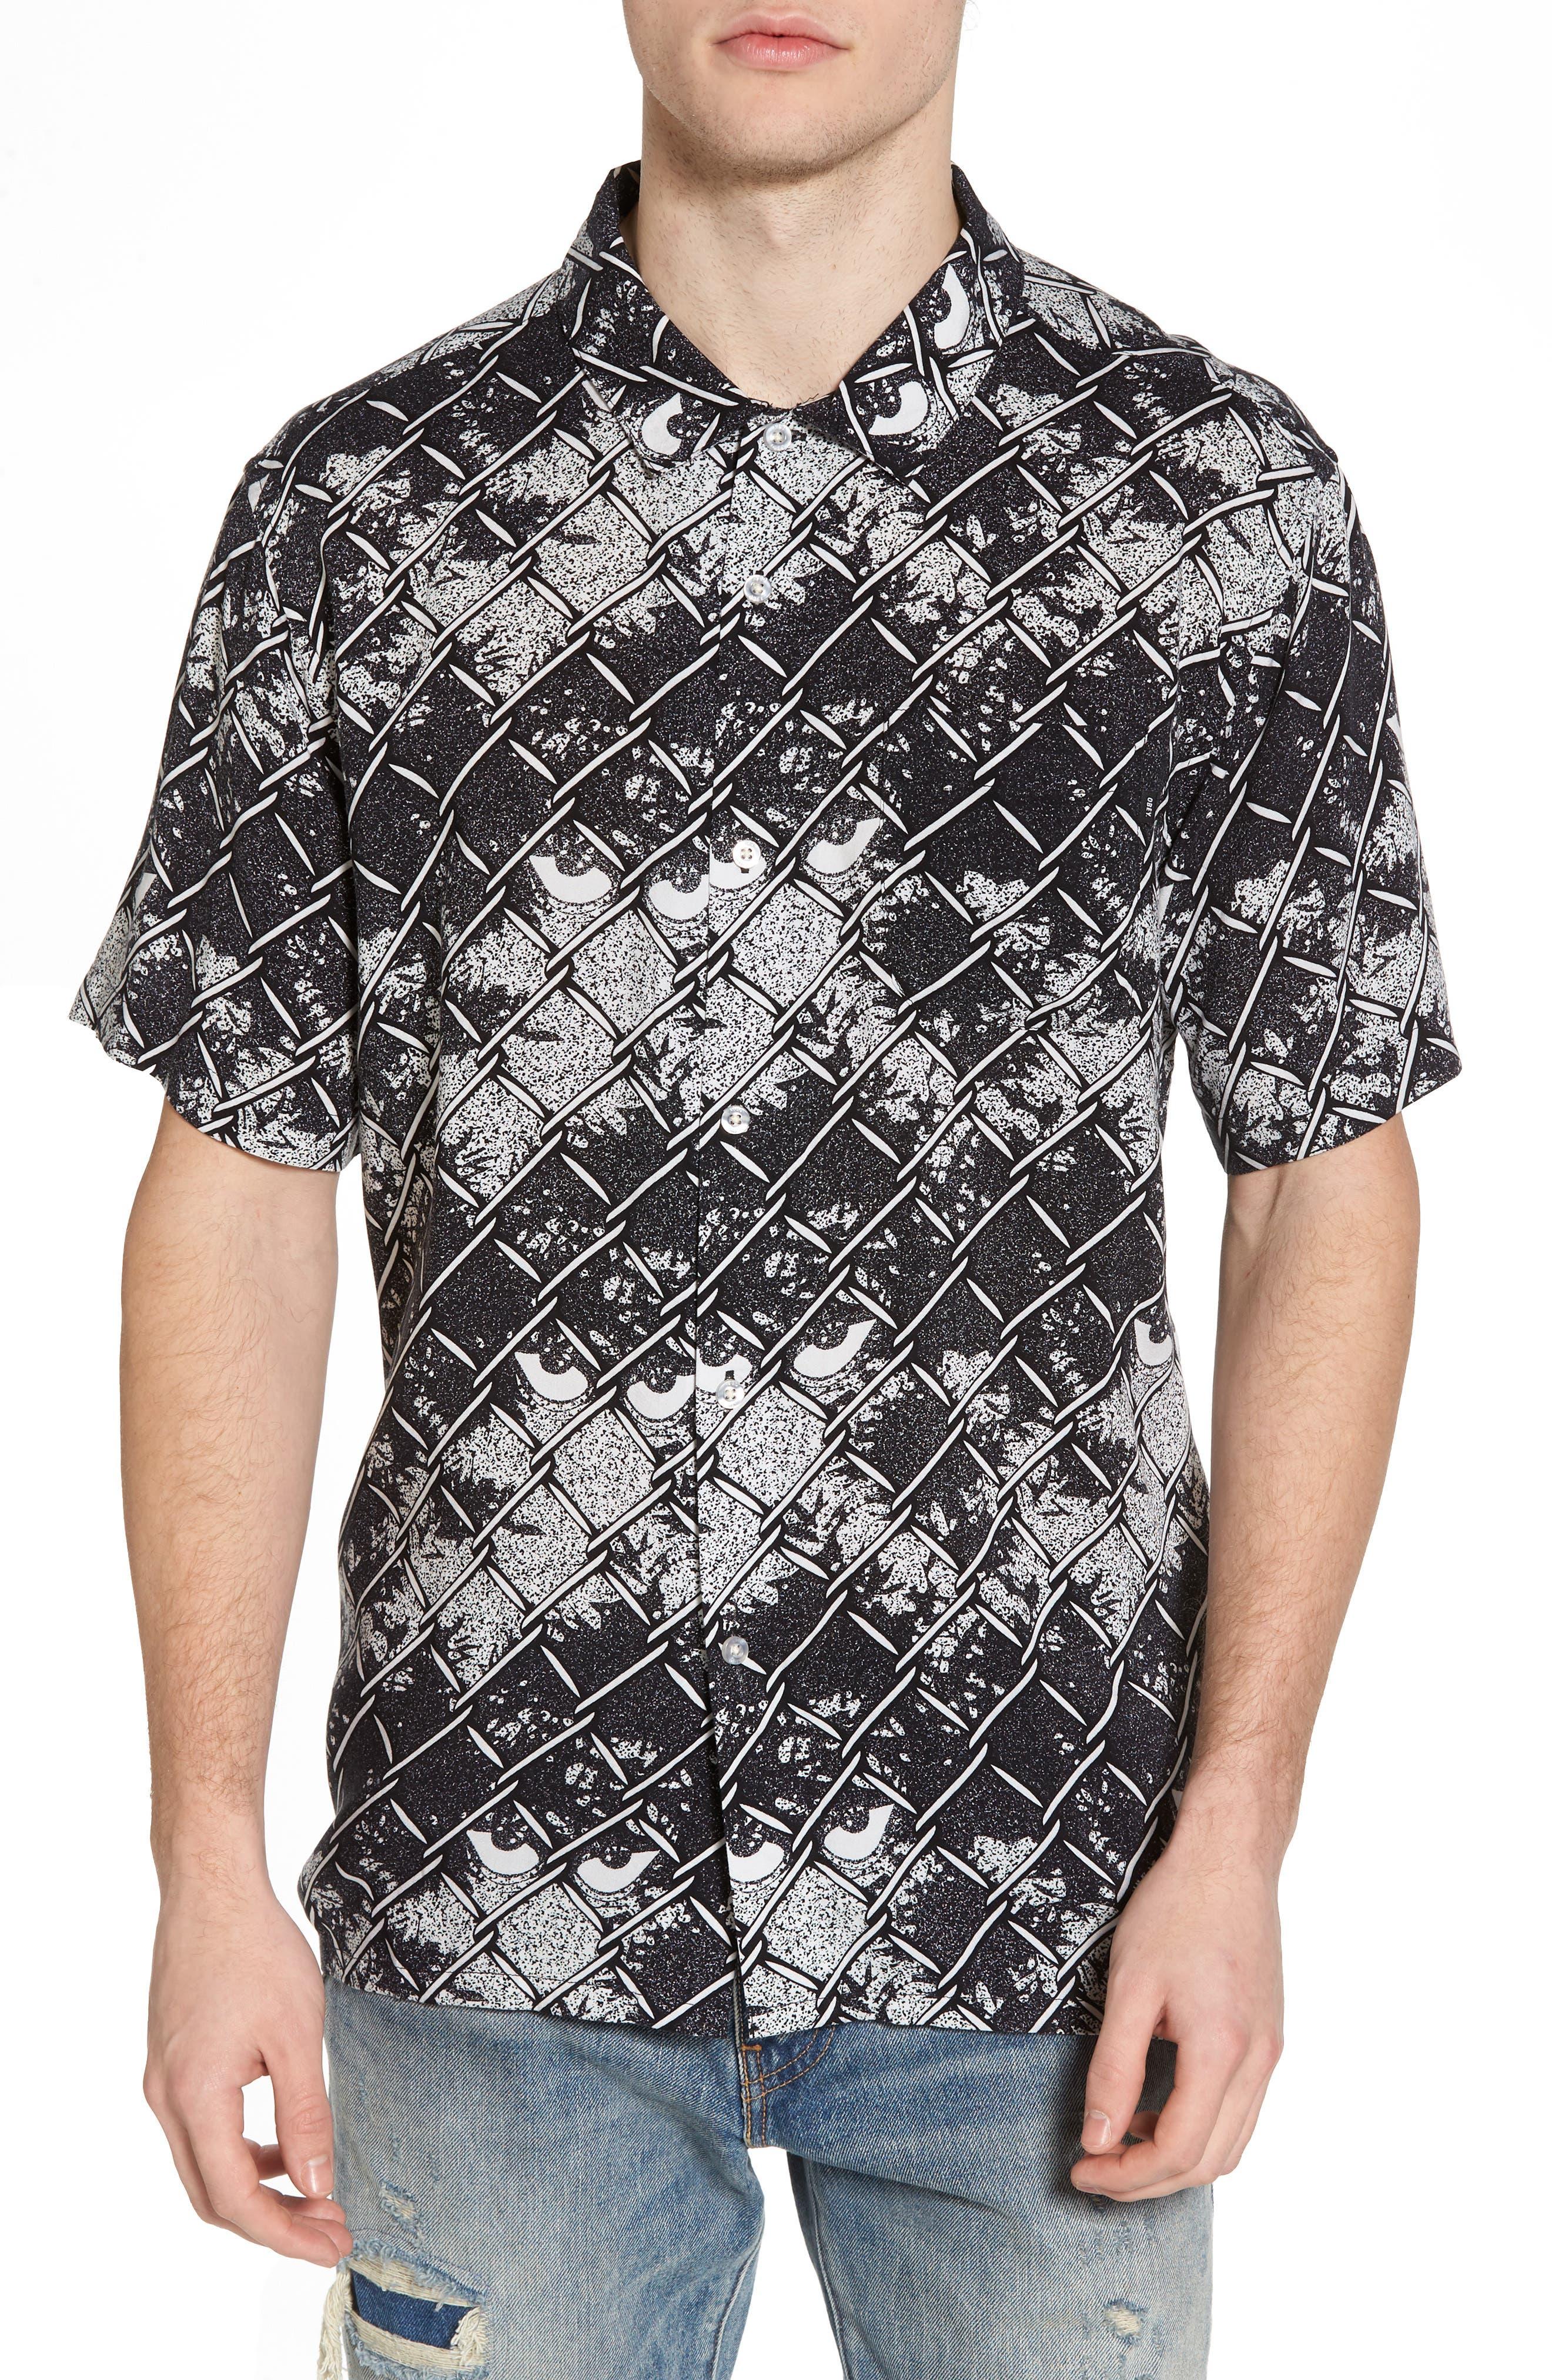 Gatekeeper Short Sleeve Shirt,                             Main thumbnail 1, color,                             002